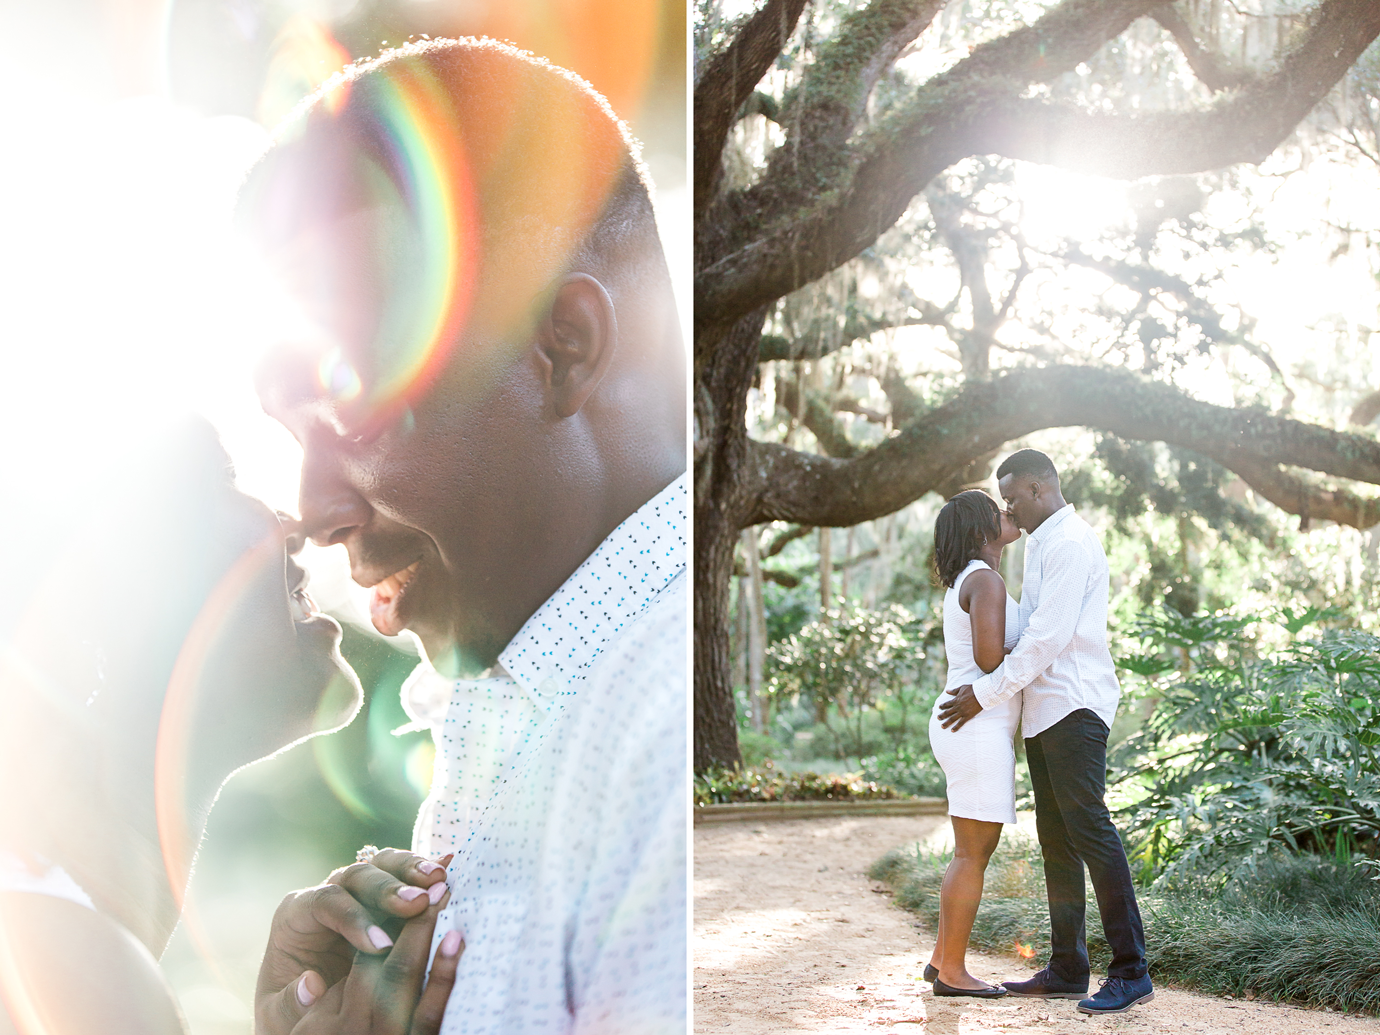 st.augustine engagement and wedding photographer. photoshoot in washington oaks gardens